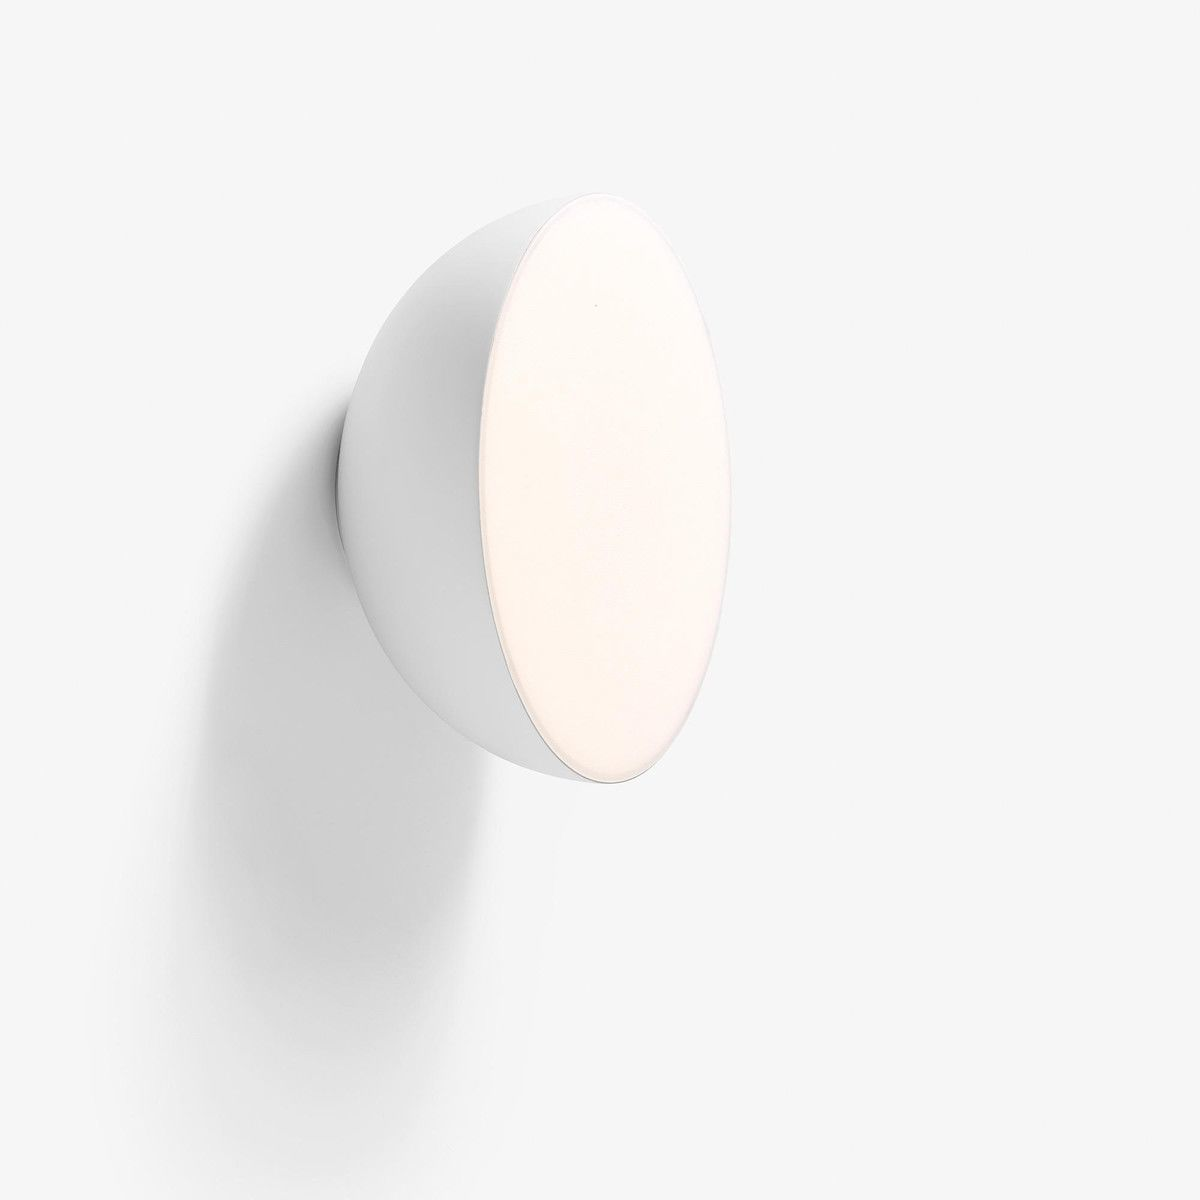 passepartout jh12 lampe murale plafonnier led. Black Bedroom Furniture Sets. Home Design Ideas